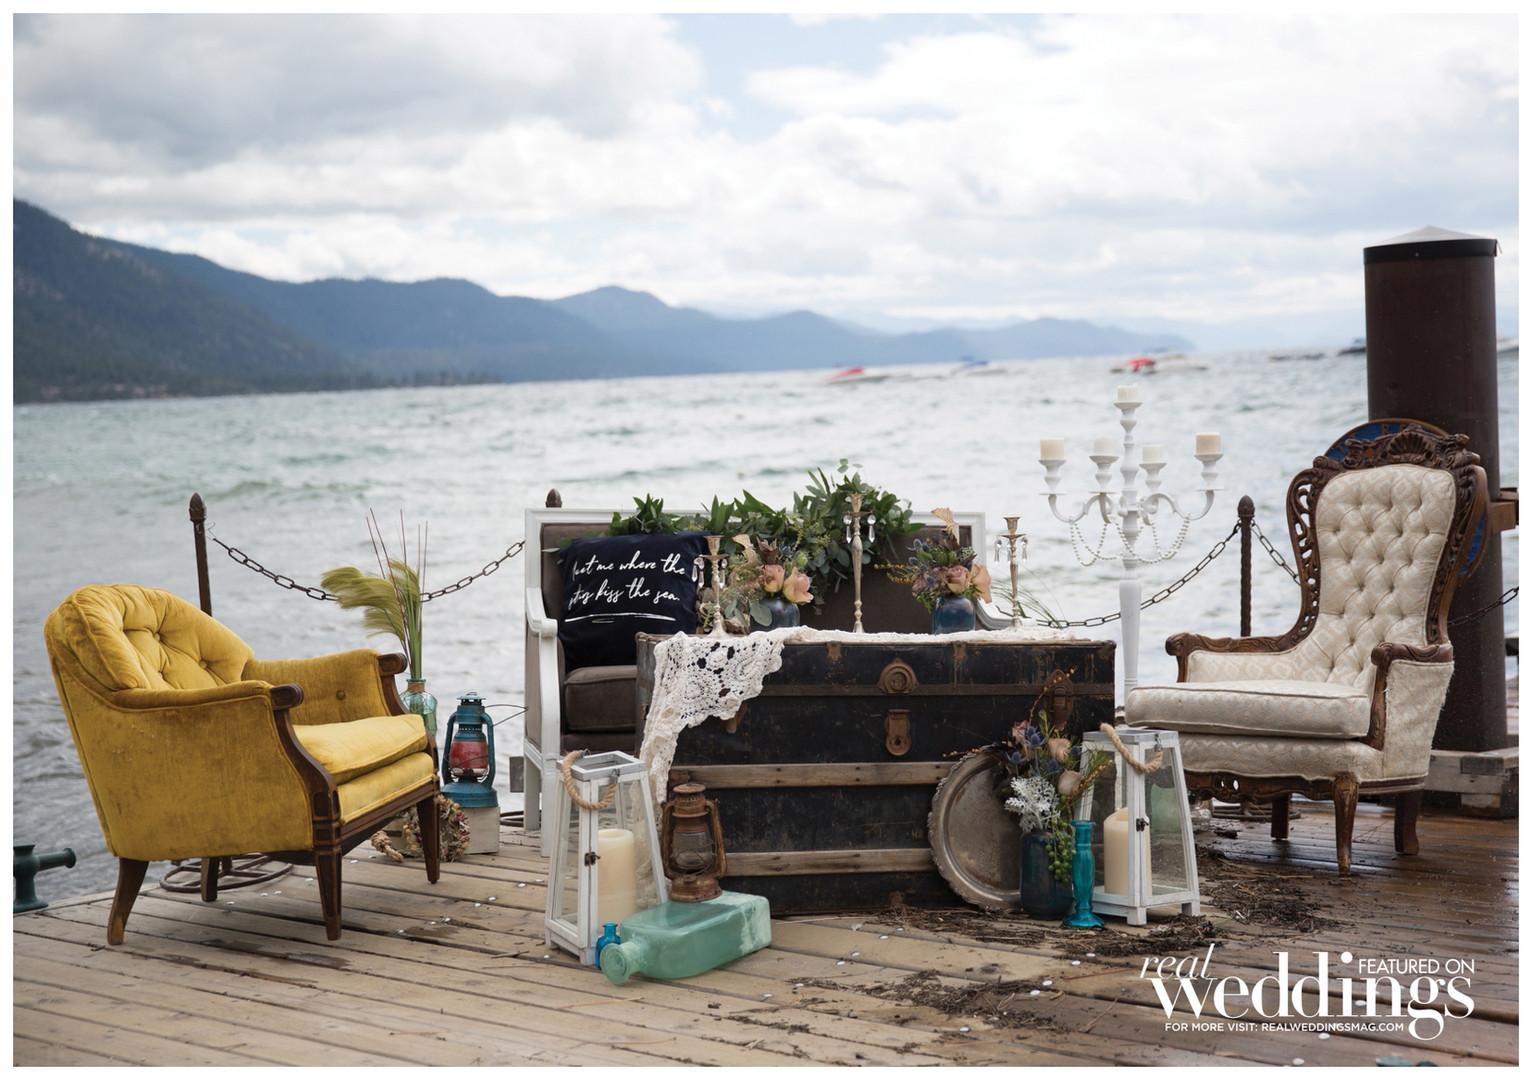 Real Weddings Magazine_Randy_Jackson_Pho